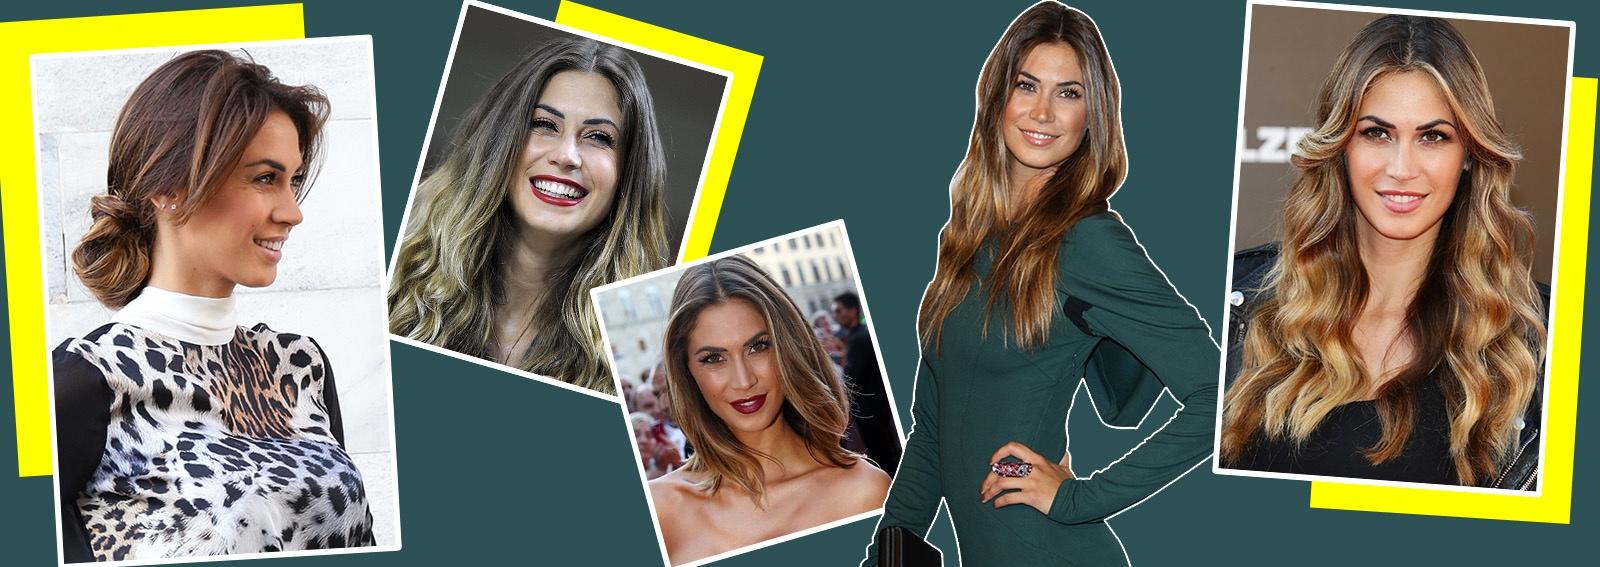 melissa satta capelli lisci colore shatush collage_desktop